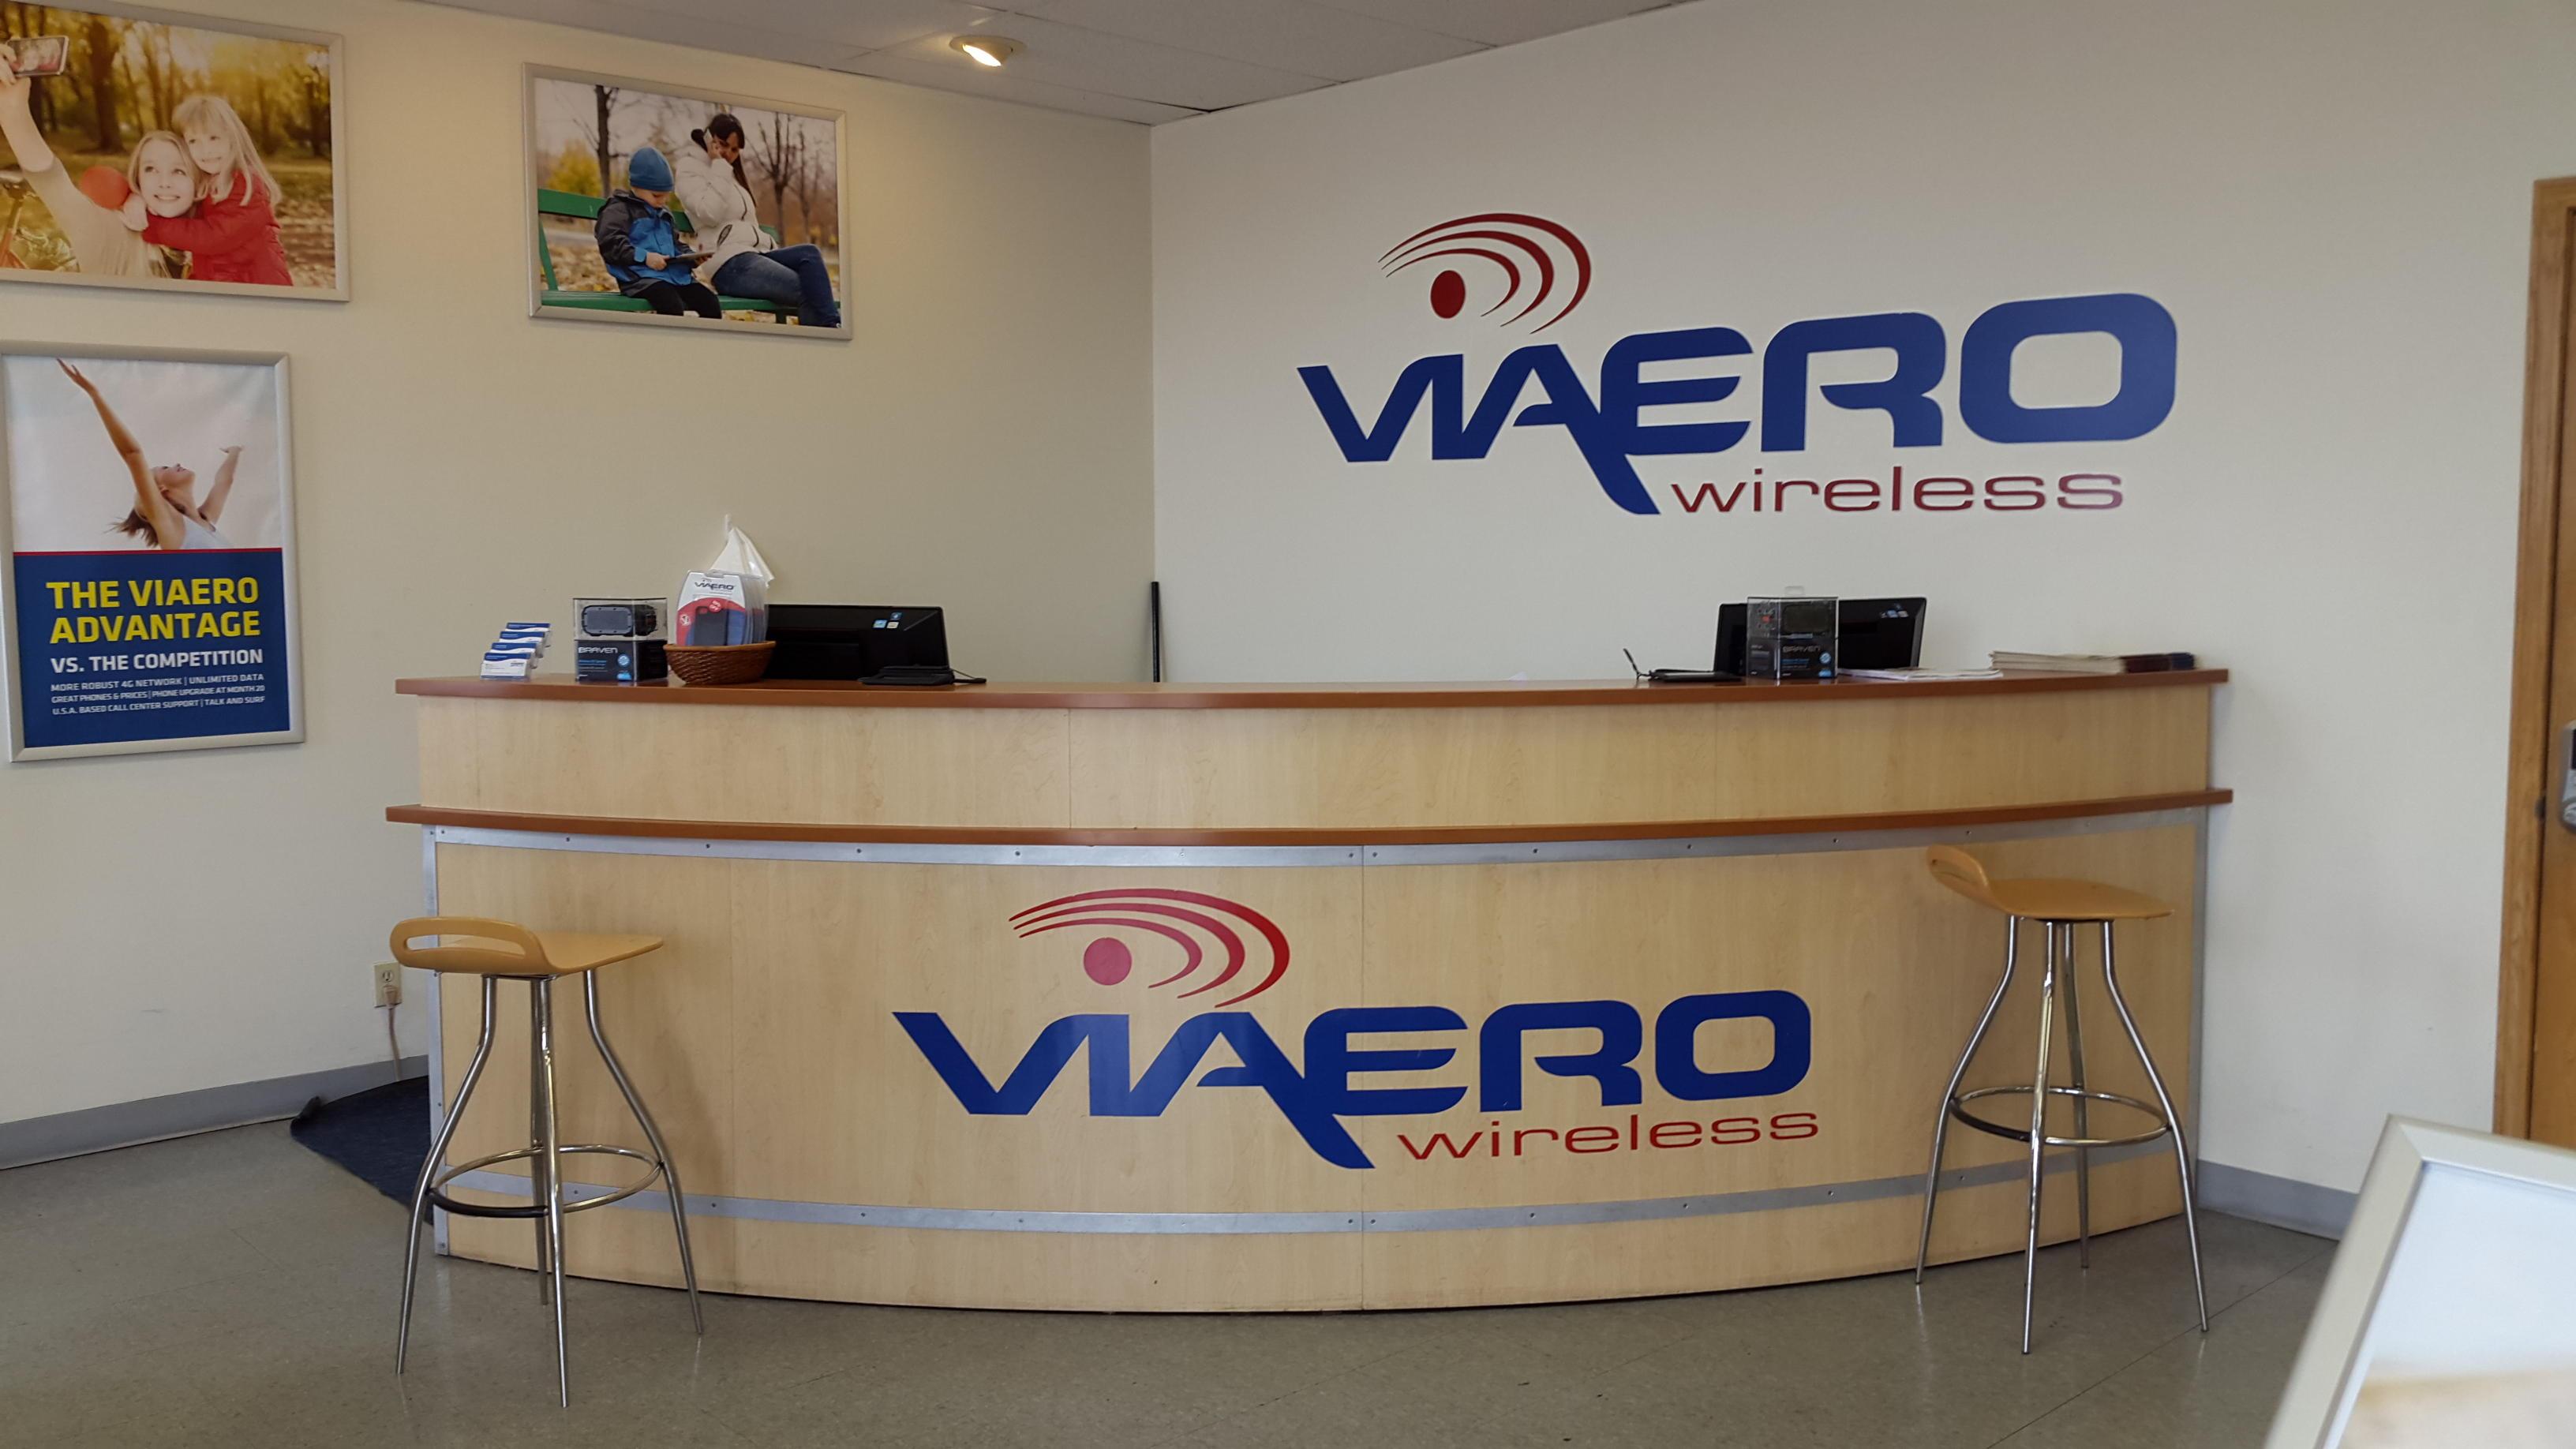 Viaero Wireless - CLOSED image 2